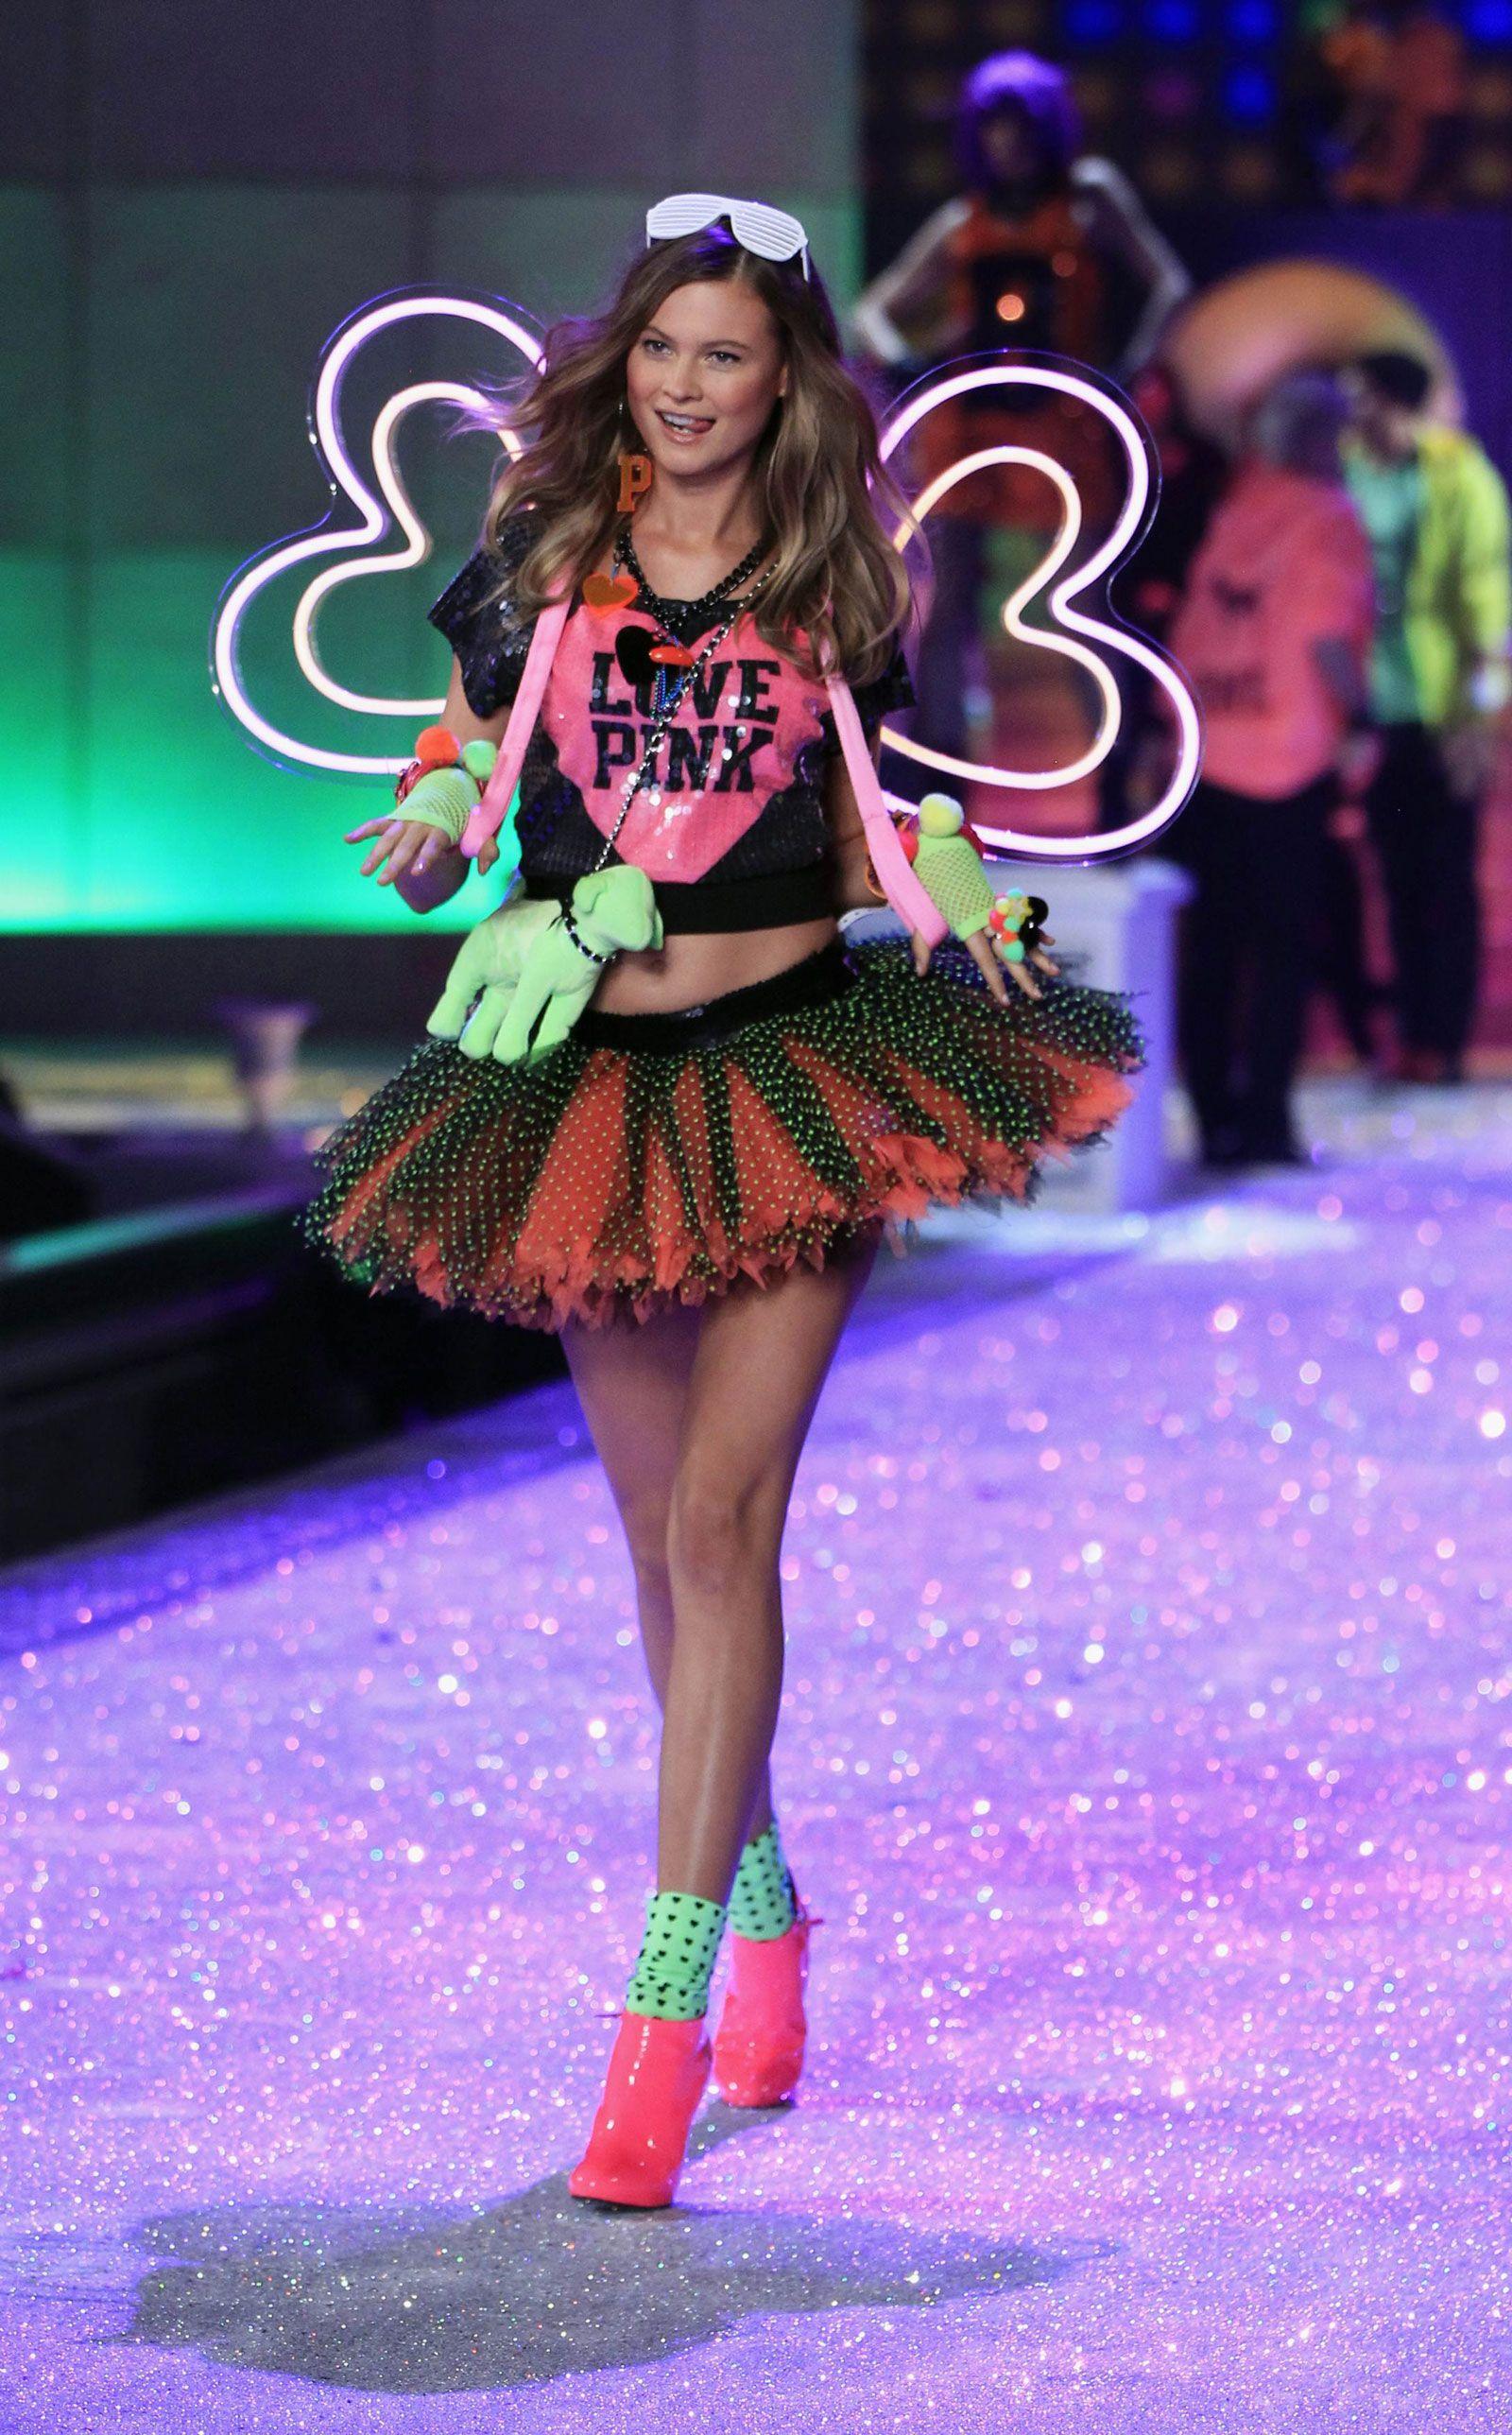 aa753e3d8a Behati Prinsloo Victoria Secret Angels